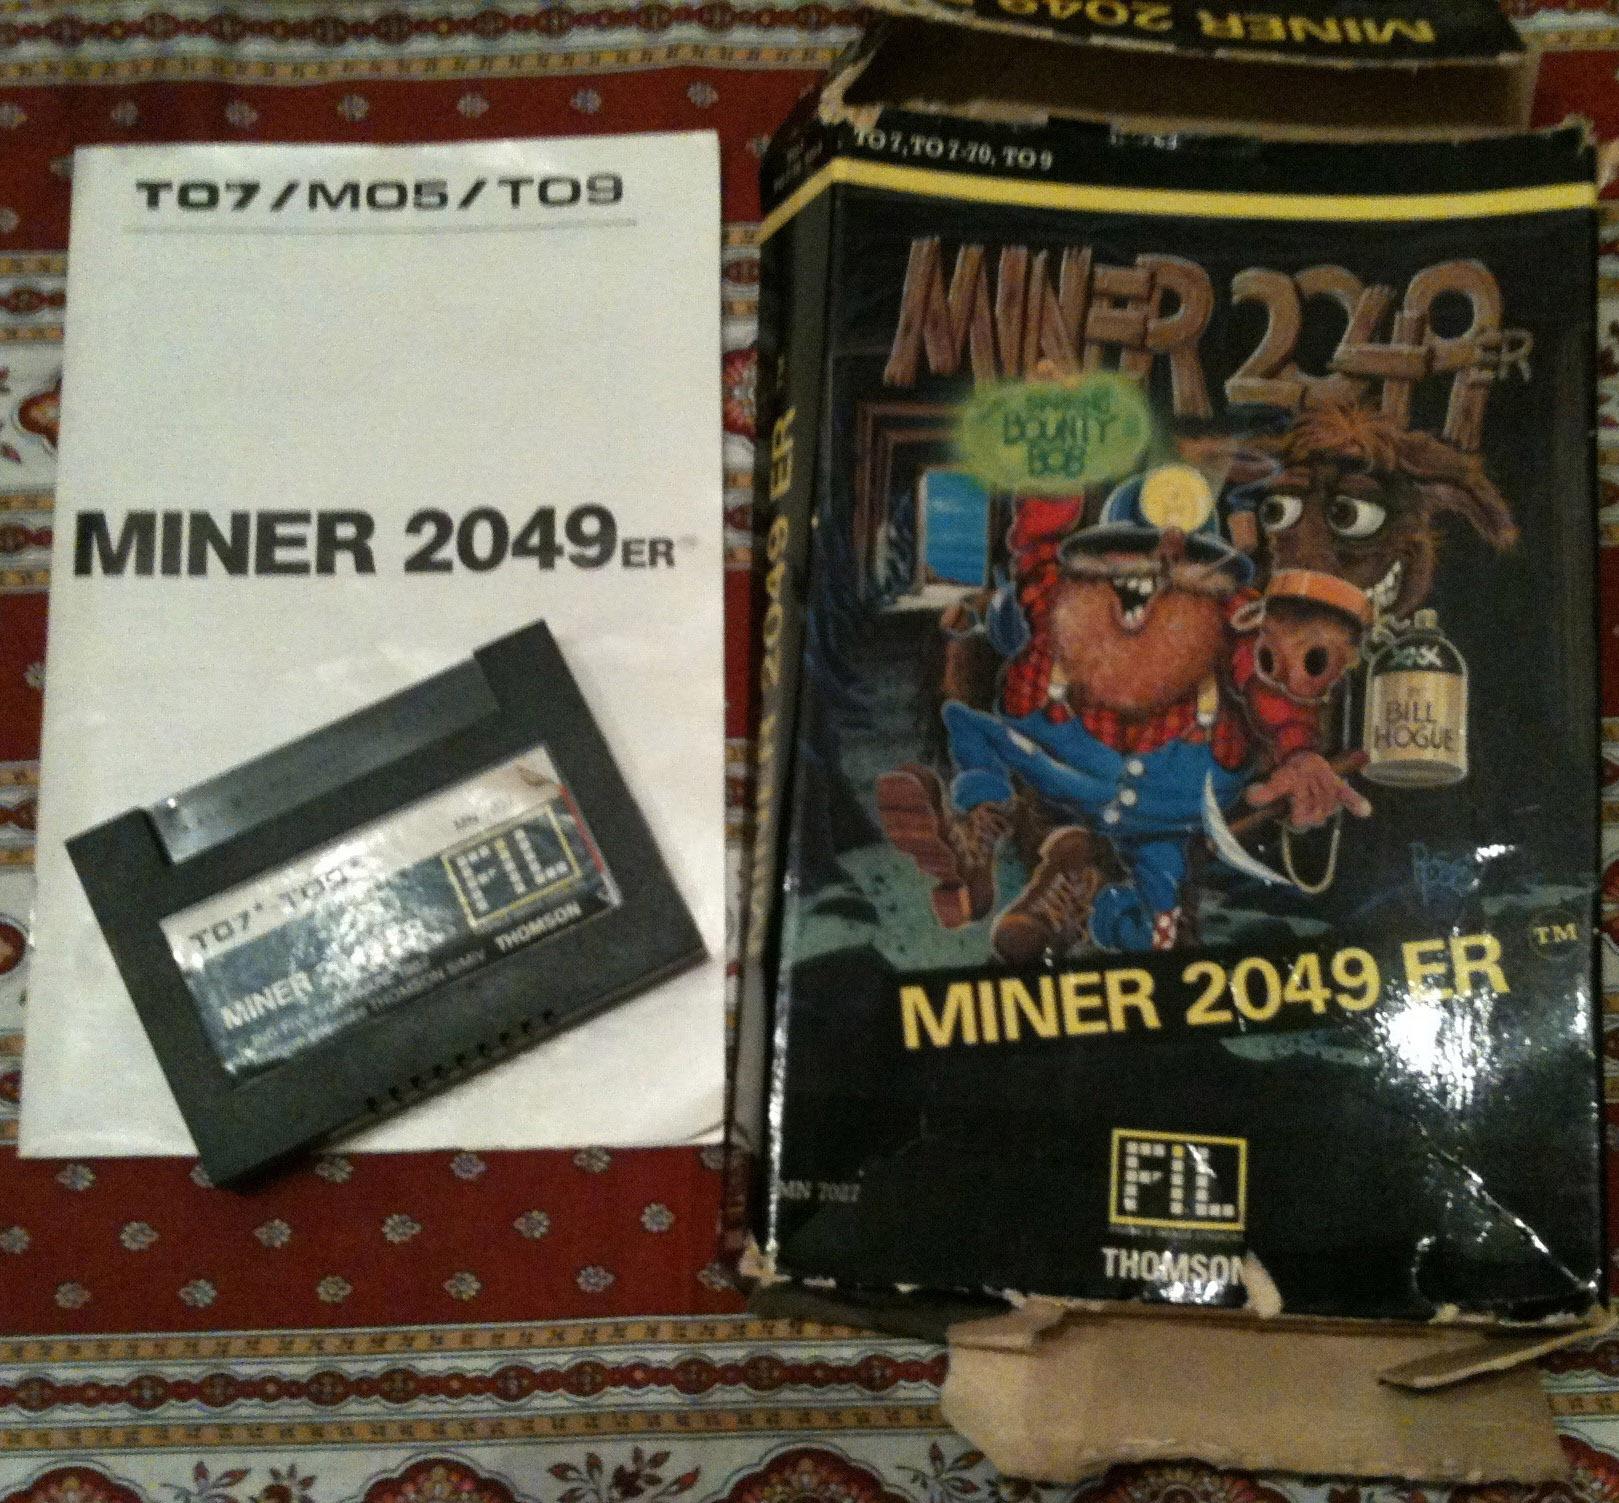 miner 2049er thomson to7 mo5 fil the miner2049er museum the miner2049er museum